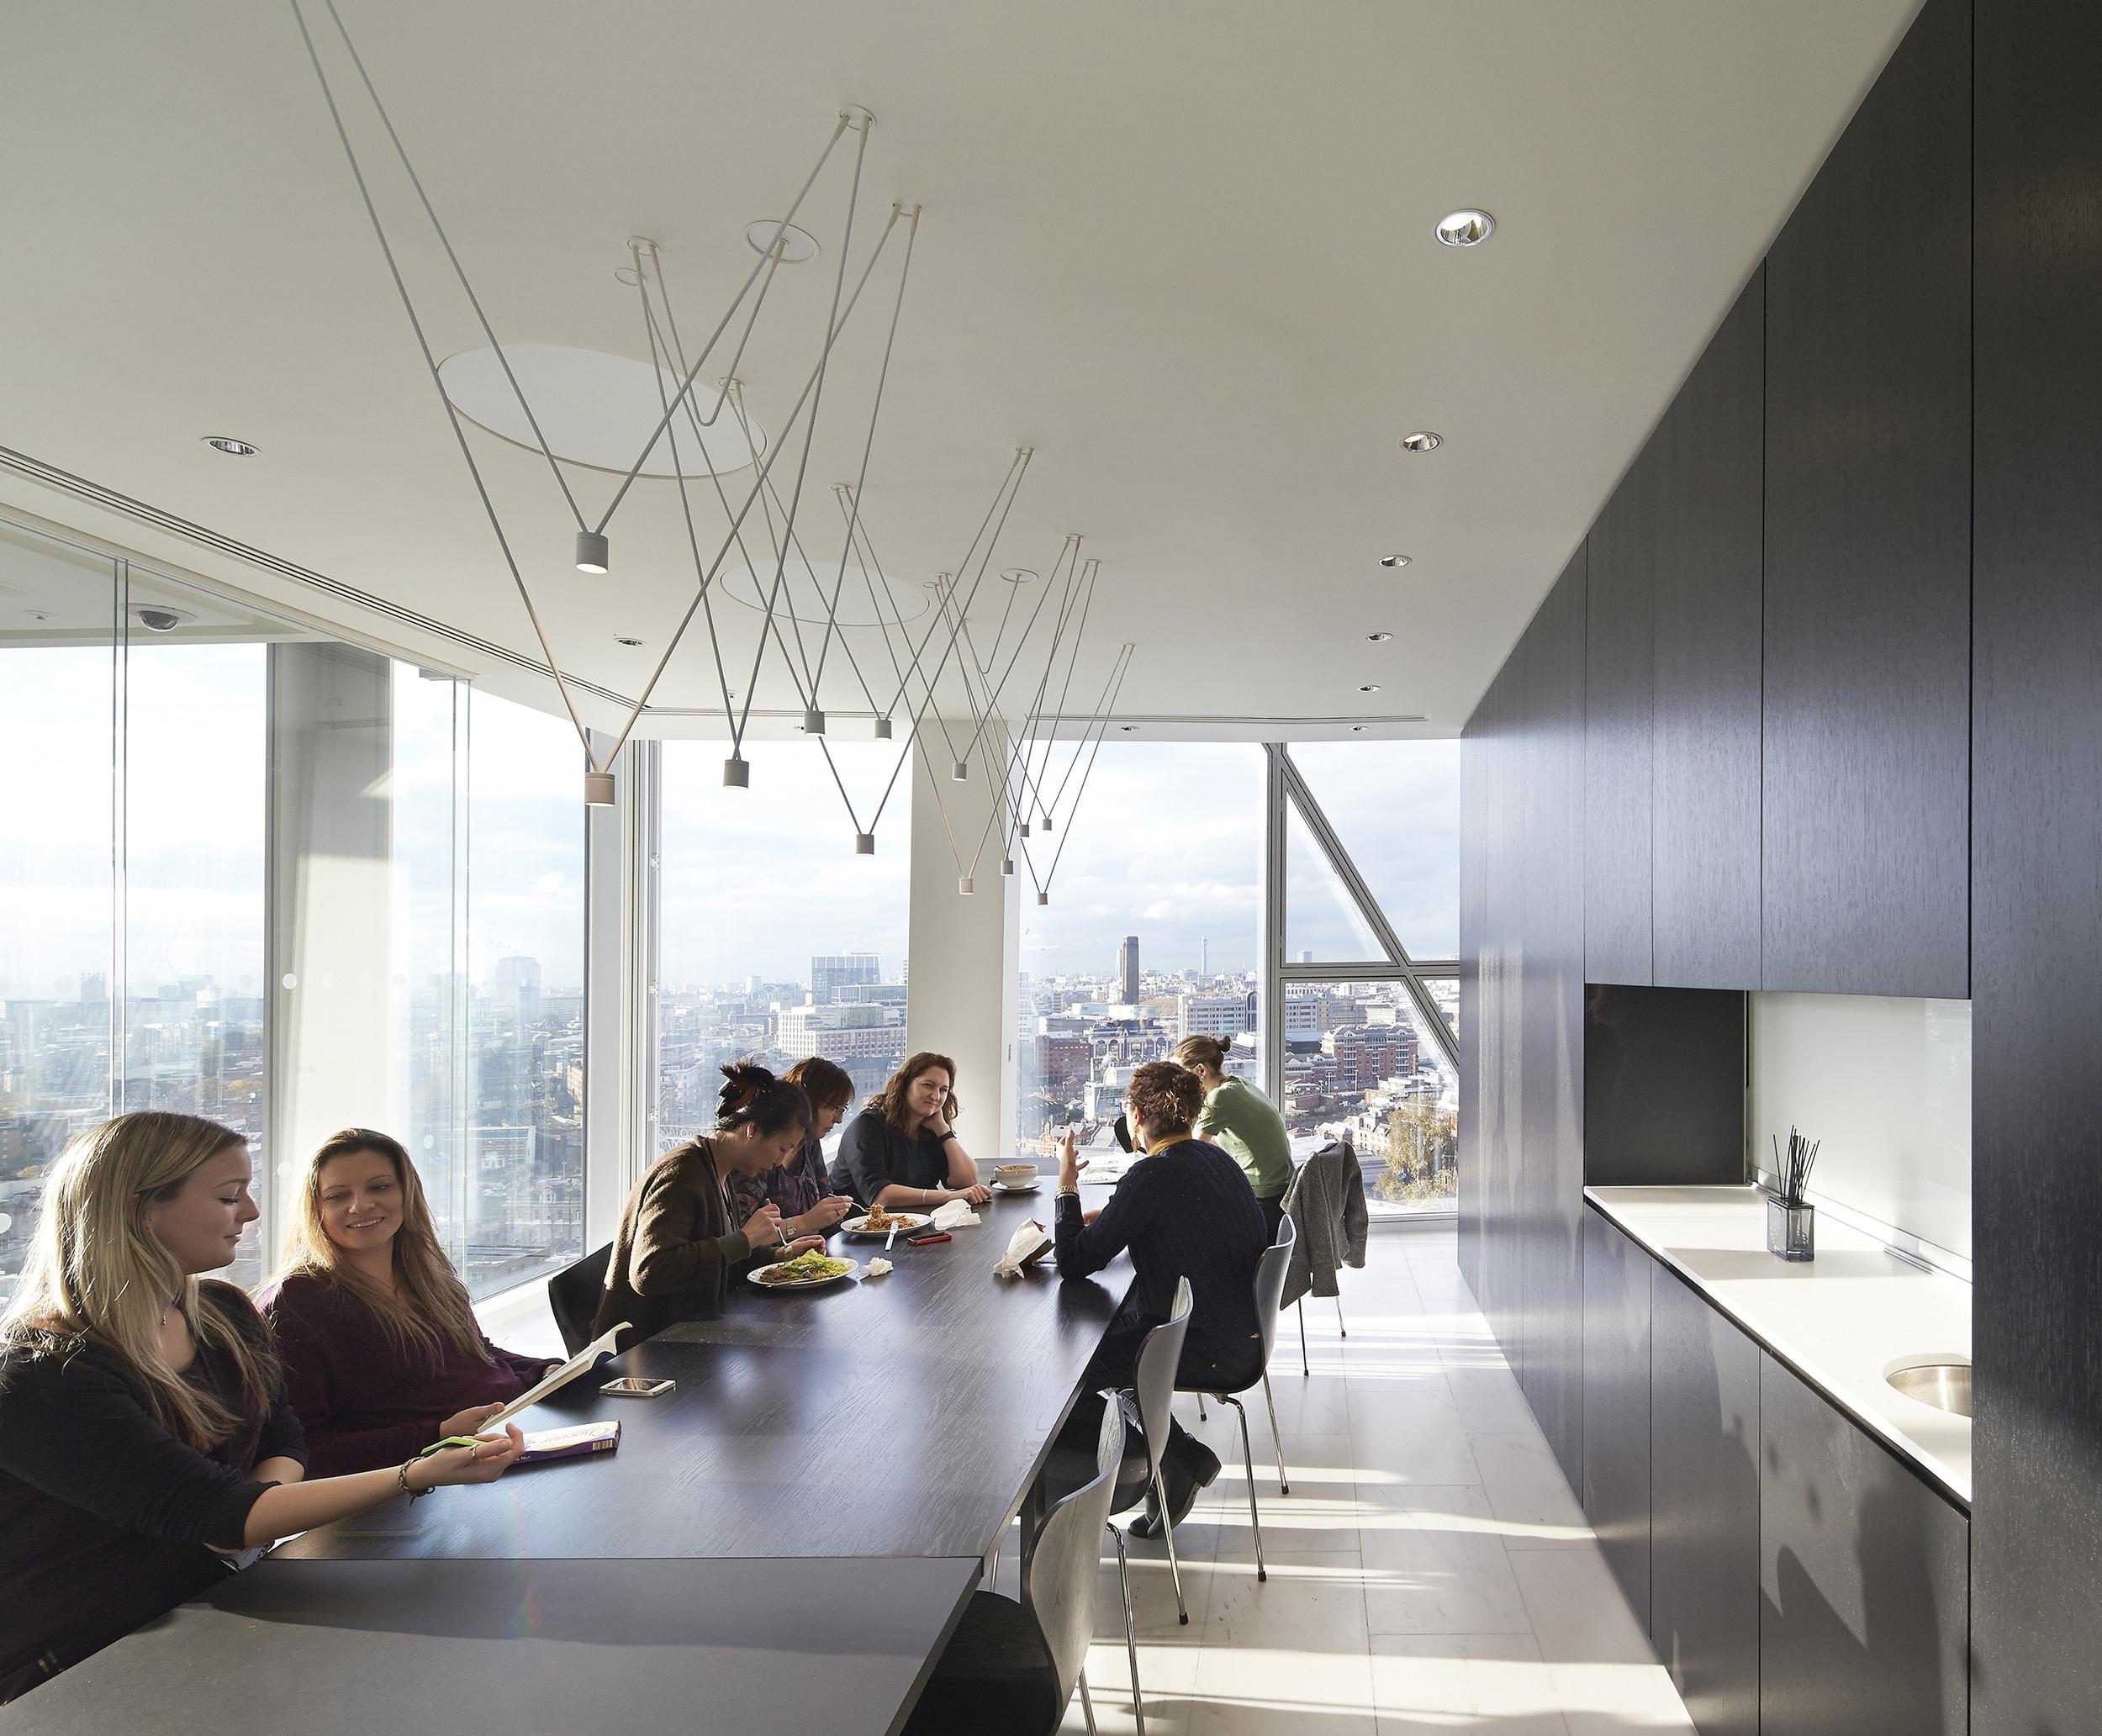 Al Jazeera Media Network UK- Meeting room by John McAslan + Partners - Photography credit Hufton+Crow.jpg